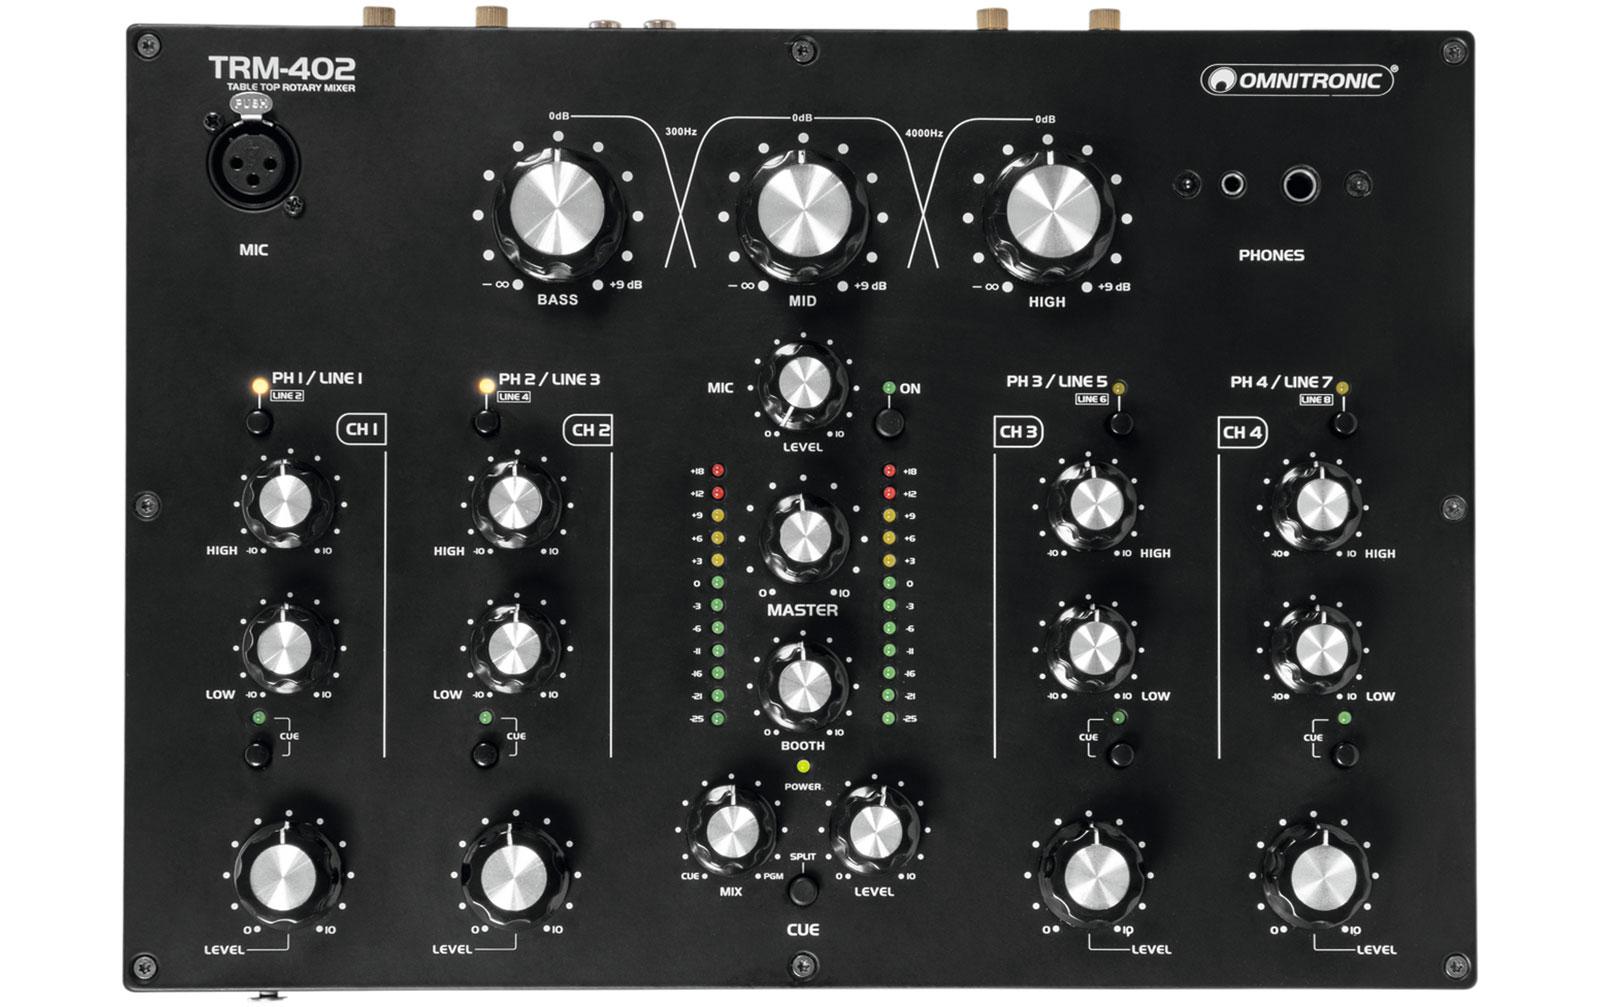 omnitronic-trm-402-4-kanal-rotary-mixer